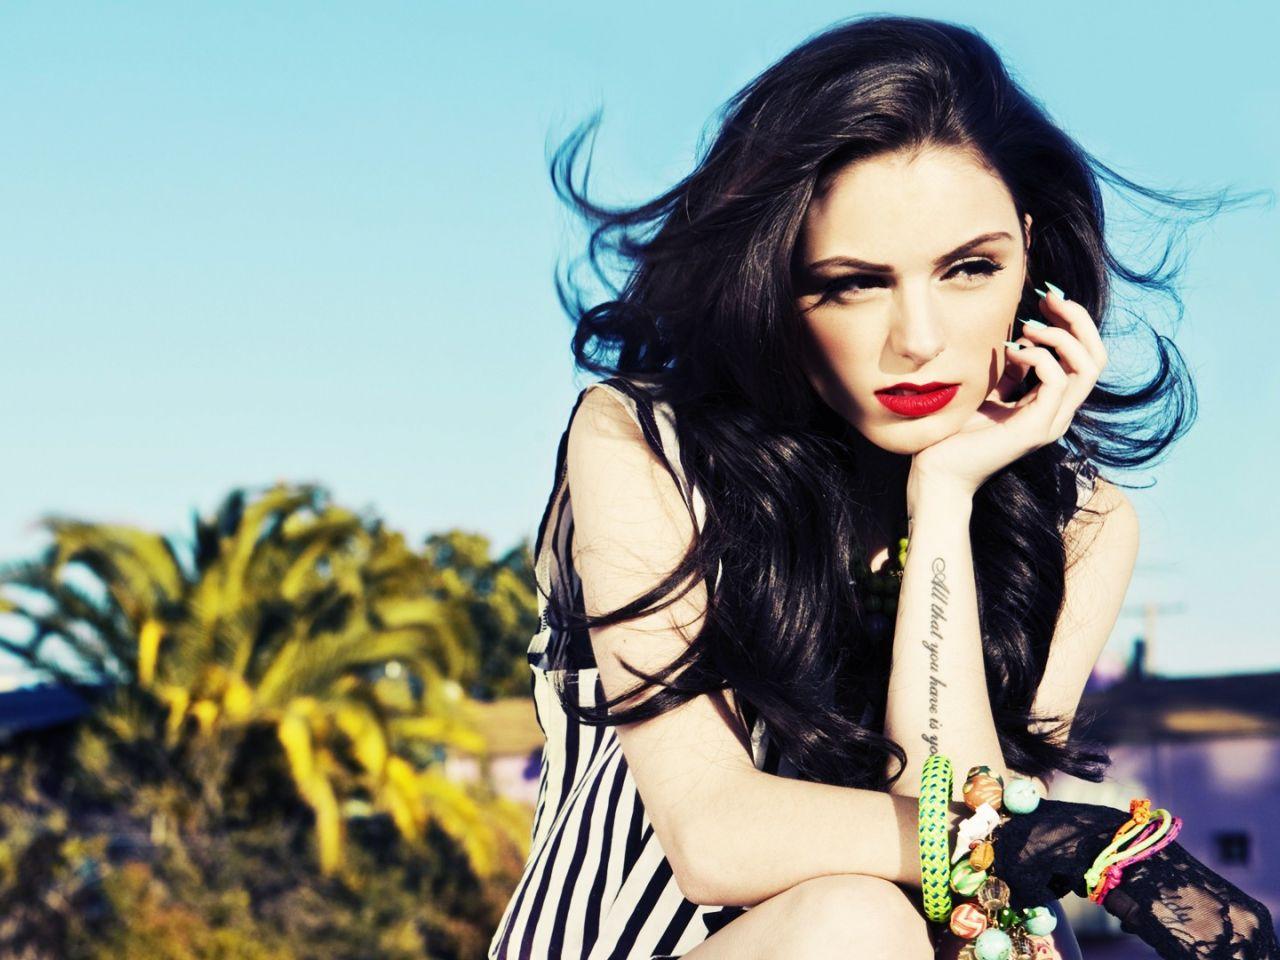 Cher Lloyd Photo 42 Of 47 Pics Wallpaper Photo Theplace2